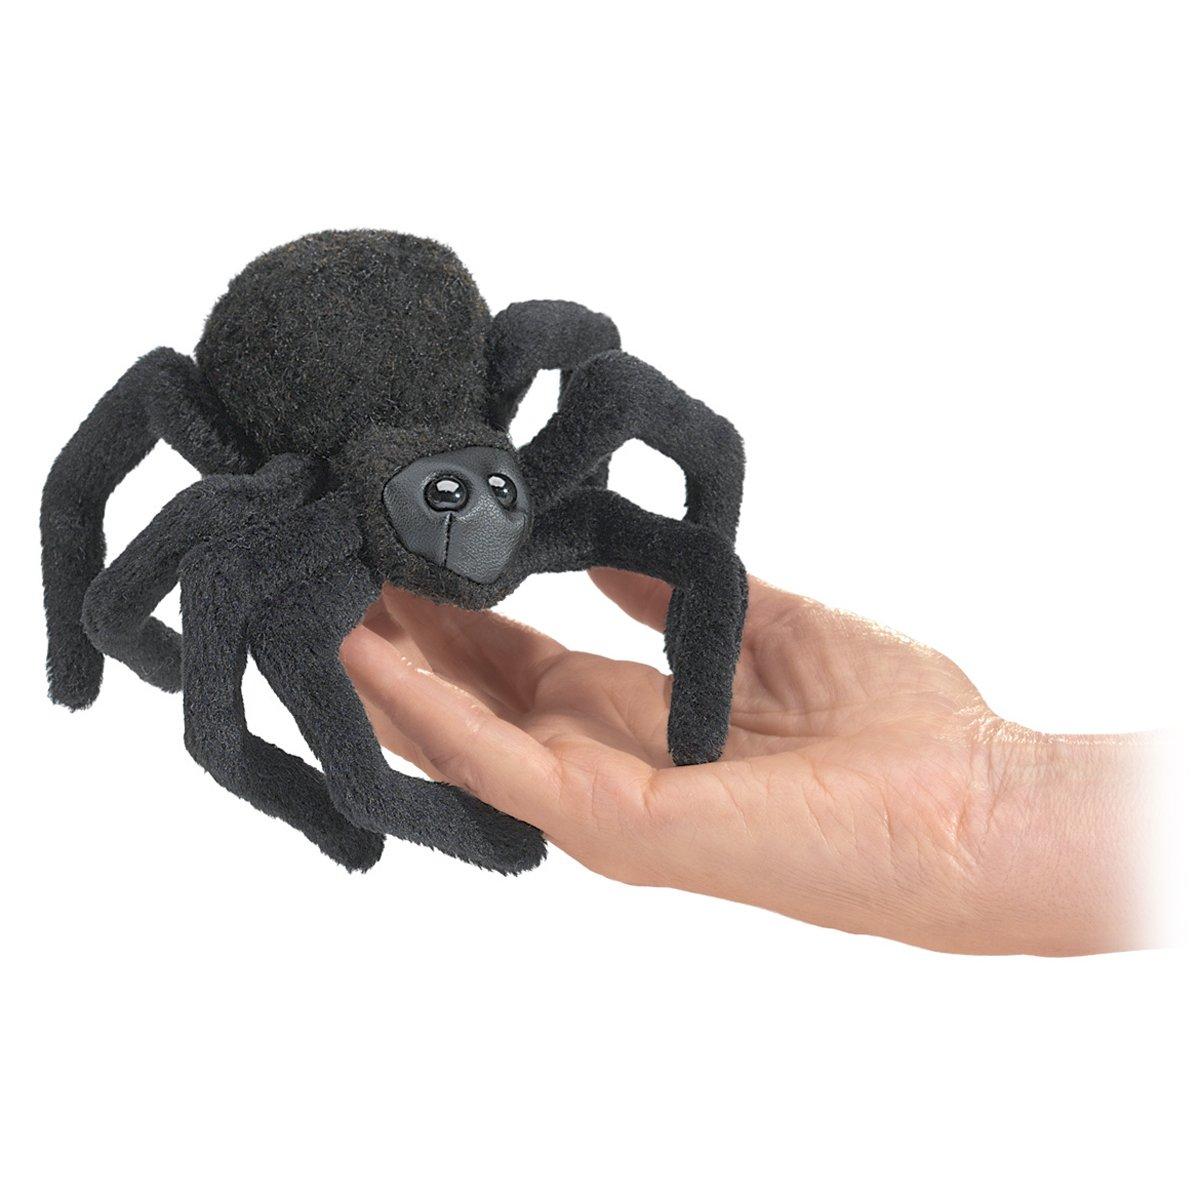 Folkmanis Mini Spider Finger Puppet Folkmanis Puppets 2754